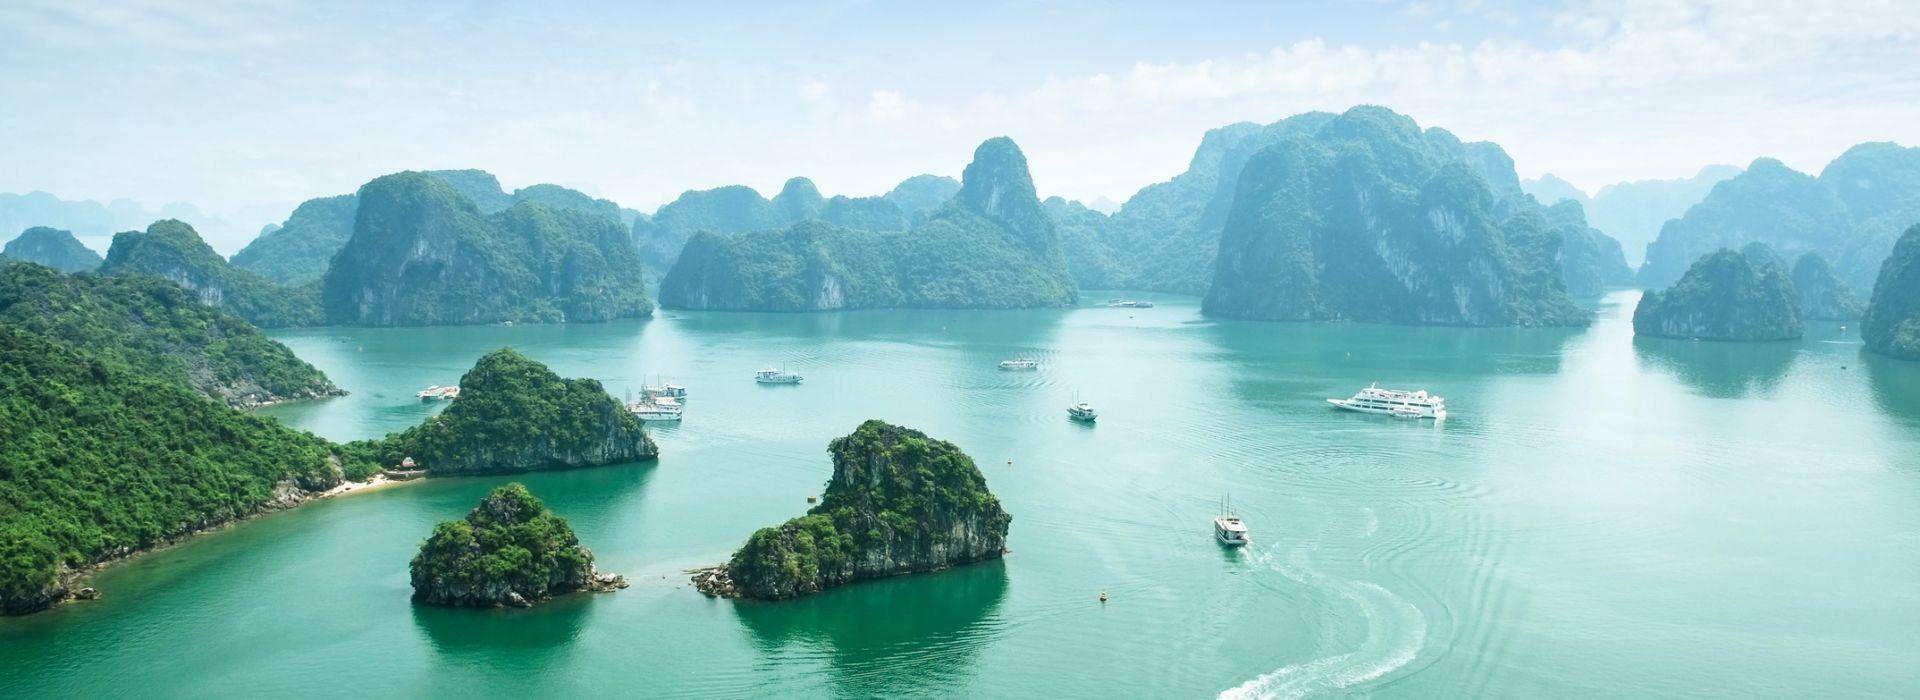 Natural landmarks sightseeing Tours in Hoi An